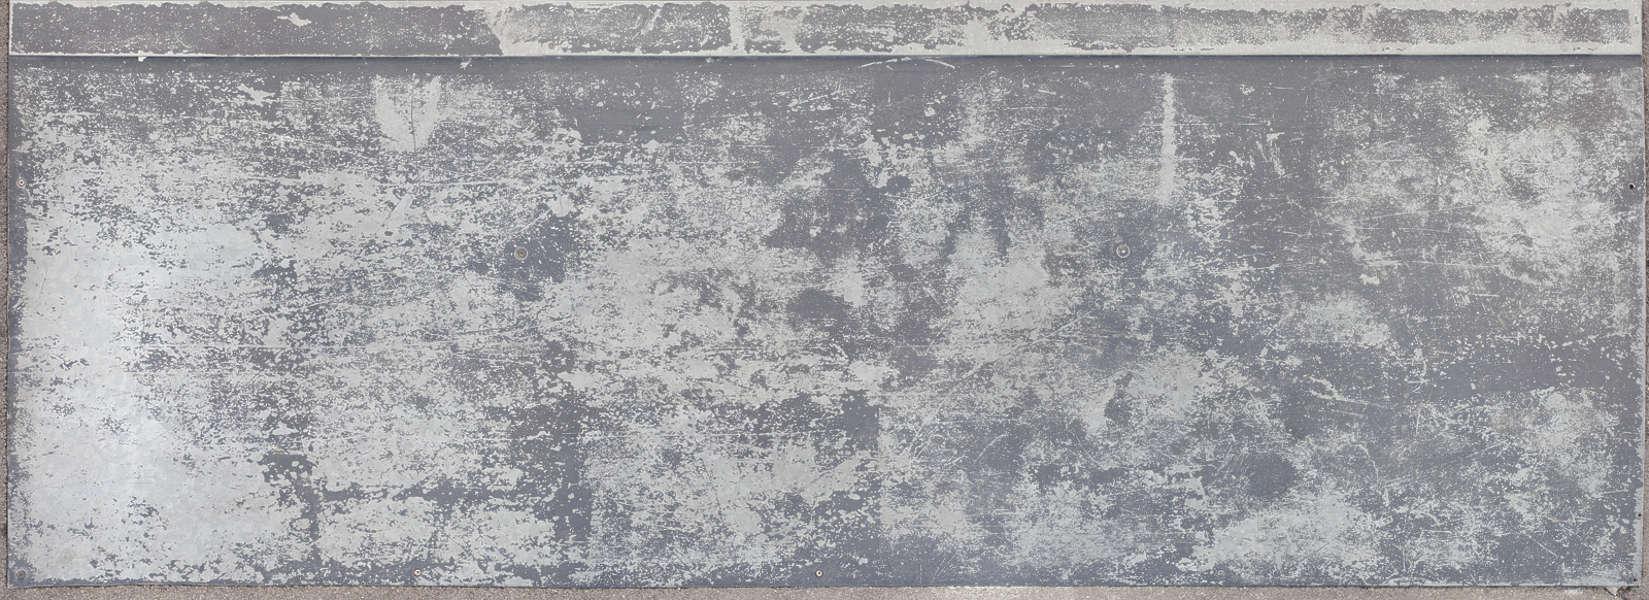 Metalplatespainted0151 Free Background Texture Metal